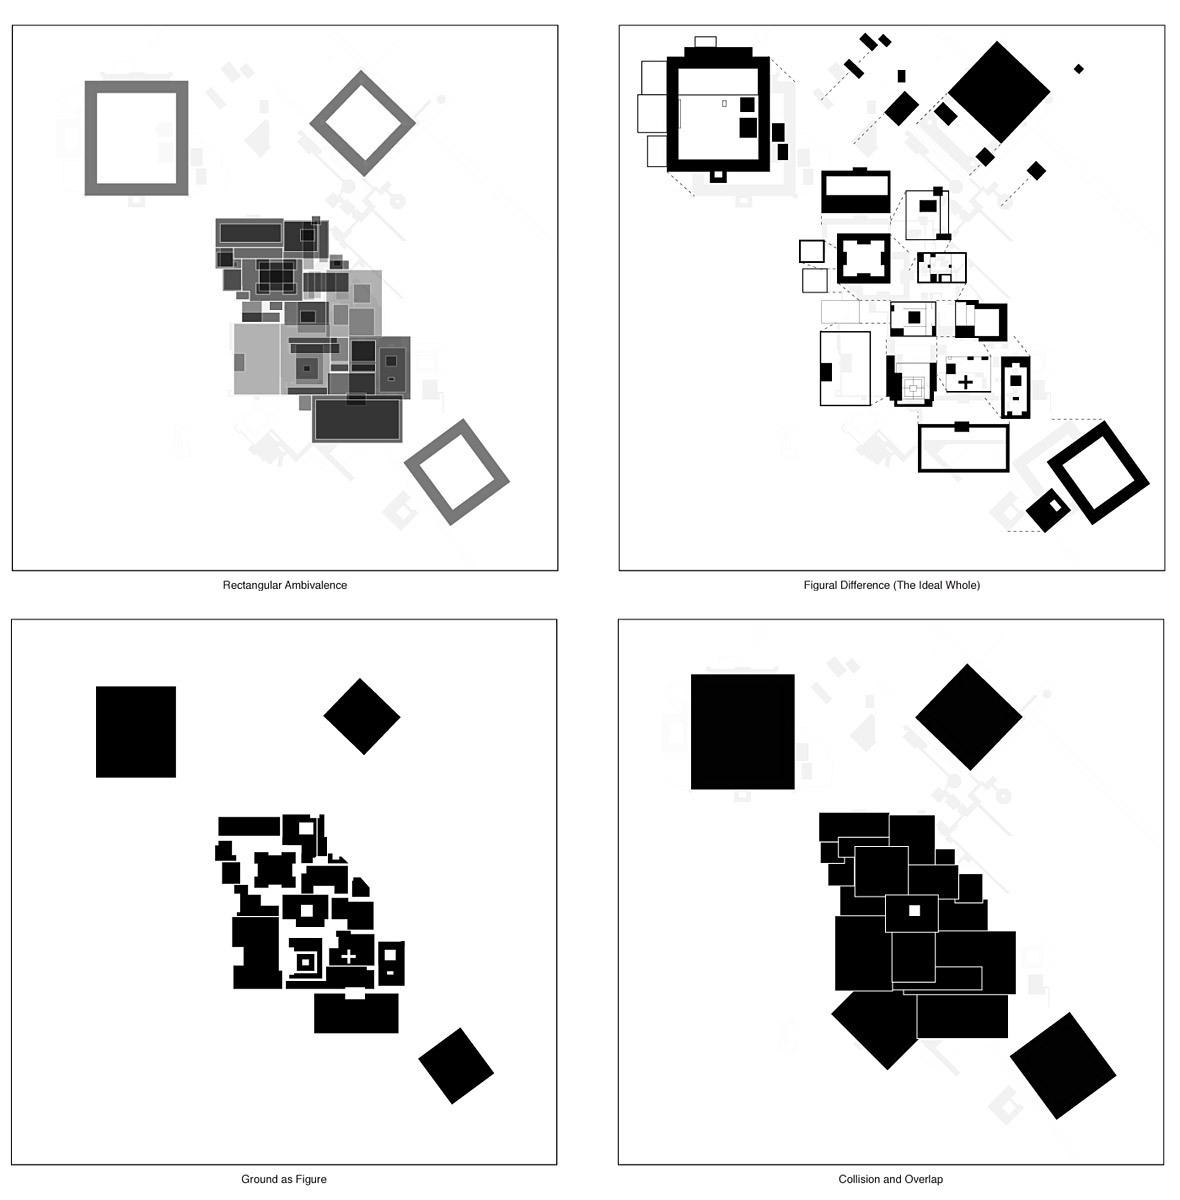 Rowe 2: Precedent Analysis Diagrams 3